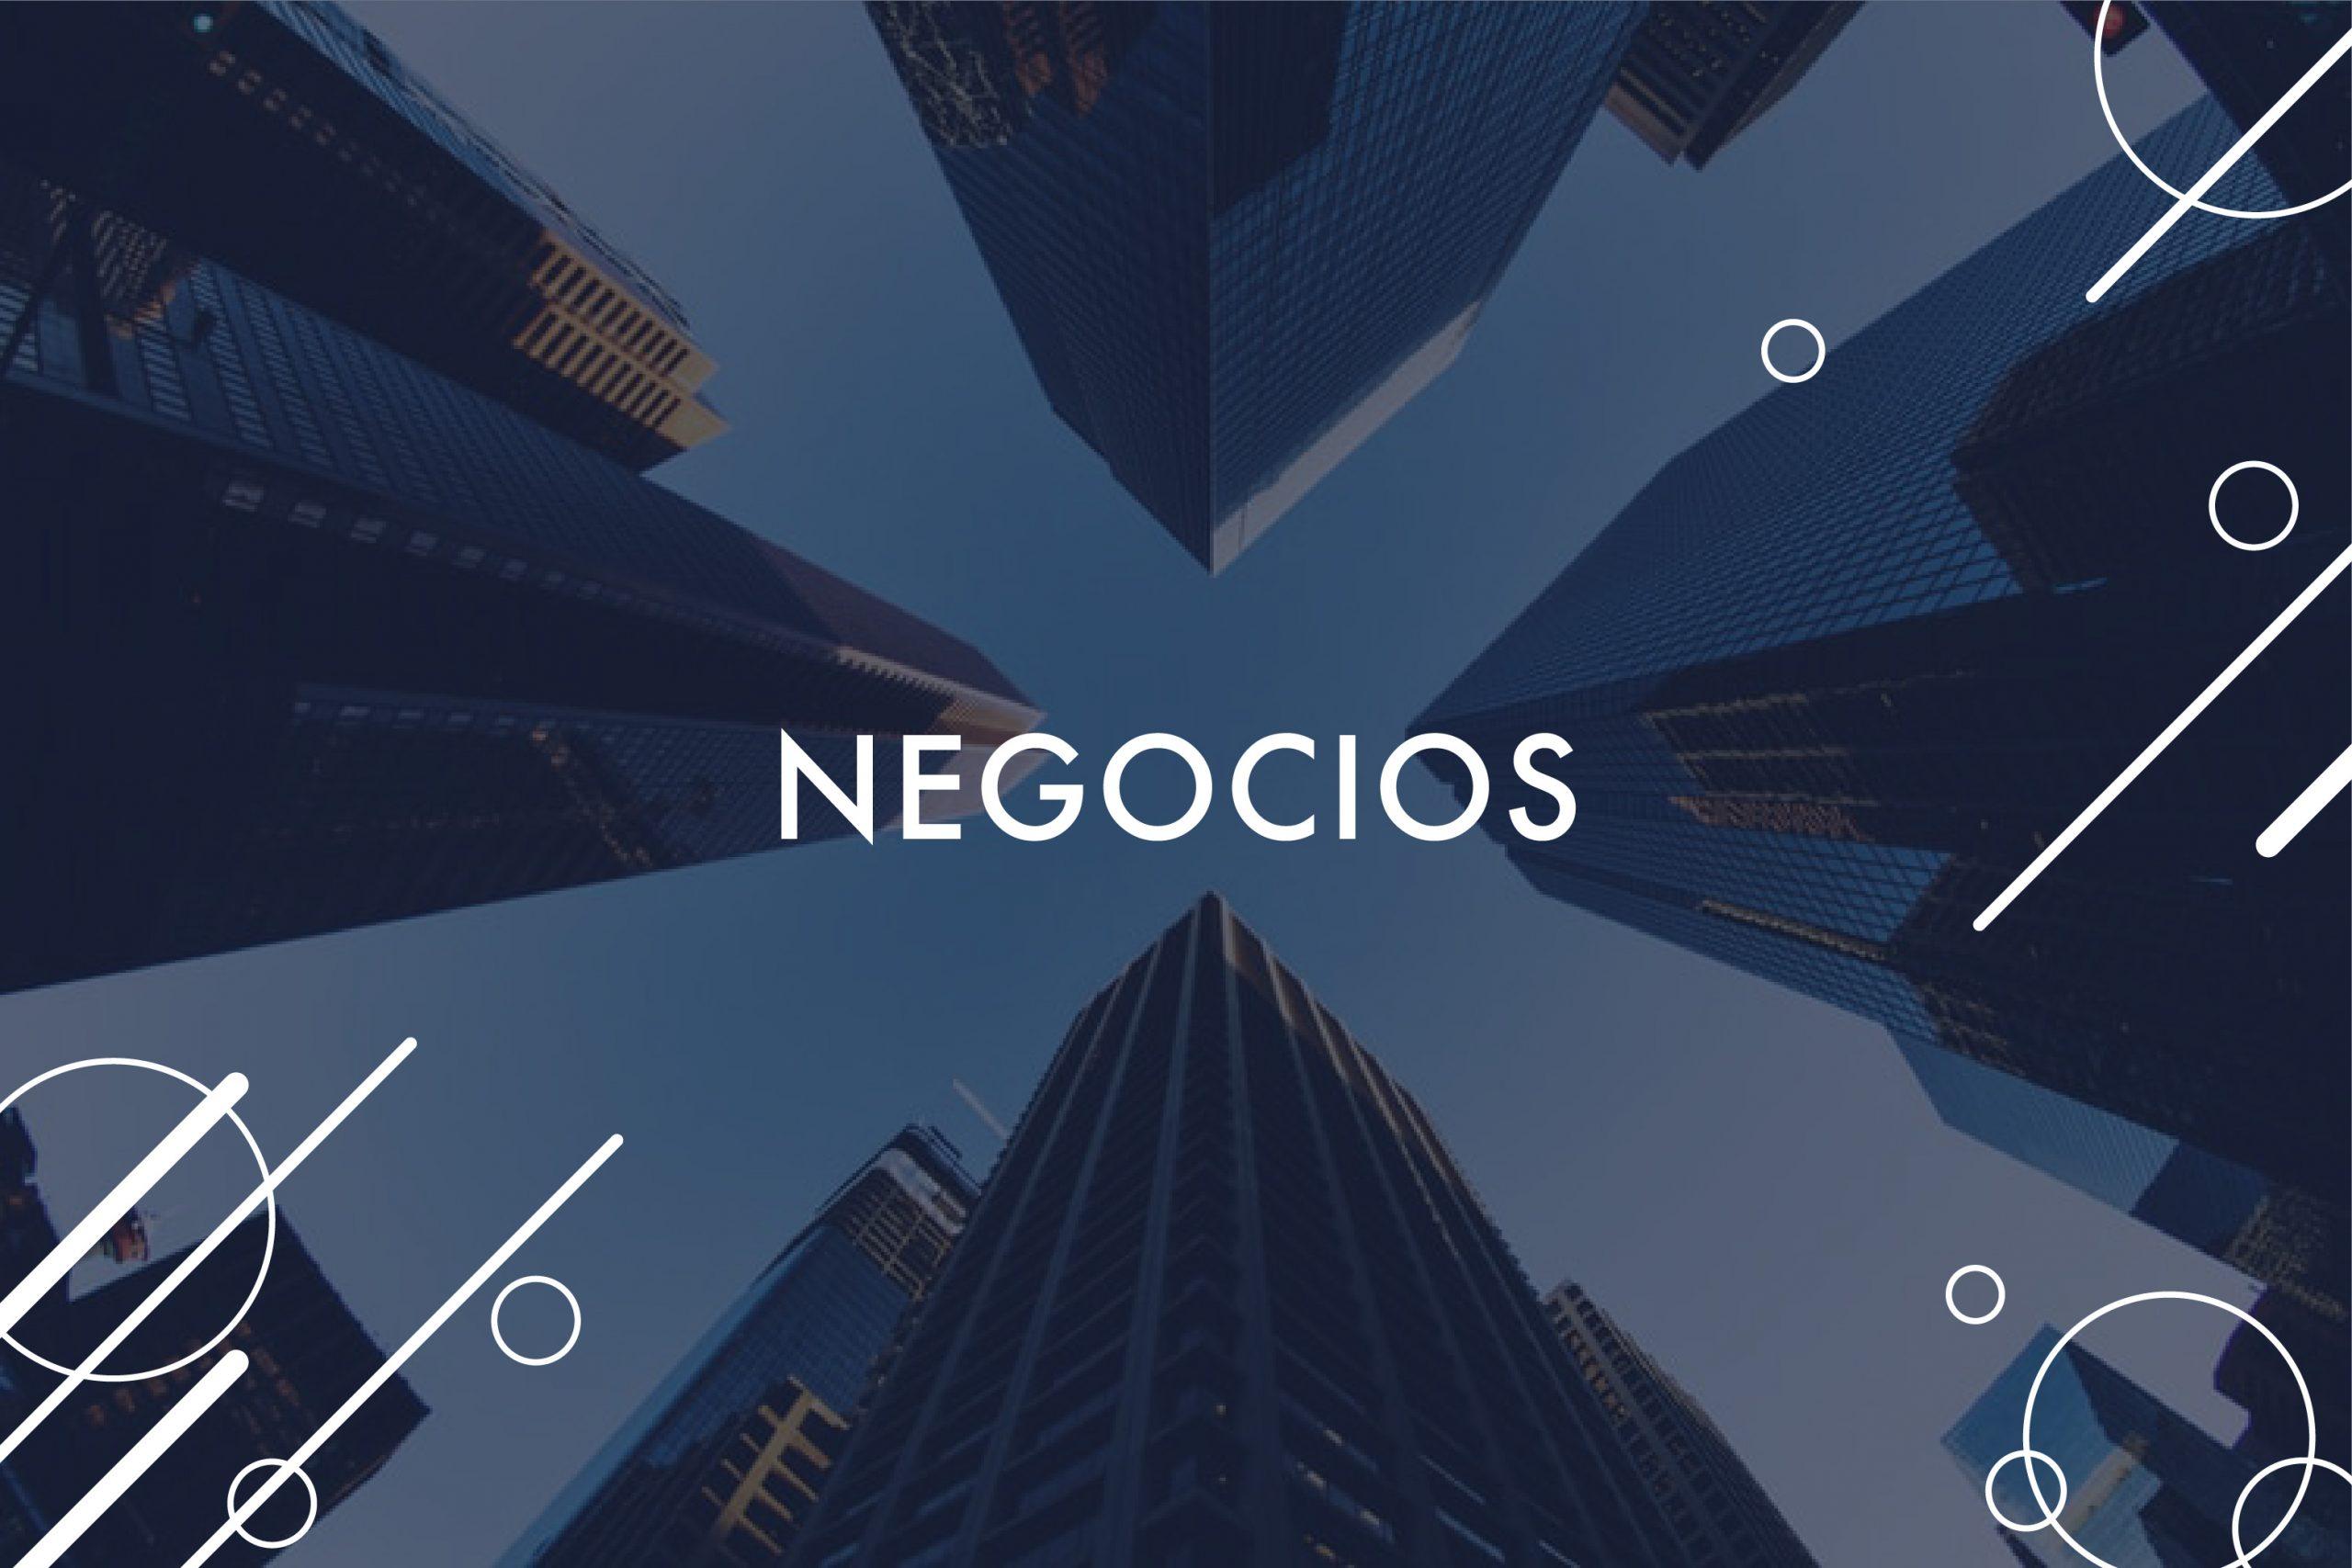 asesoria y planeacion empresarial, sat, negocios, buen fin, fin de año, aguinaldo, covid-19, coronavirus, pandemia